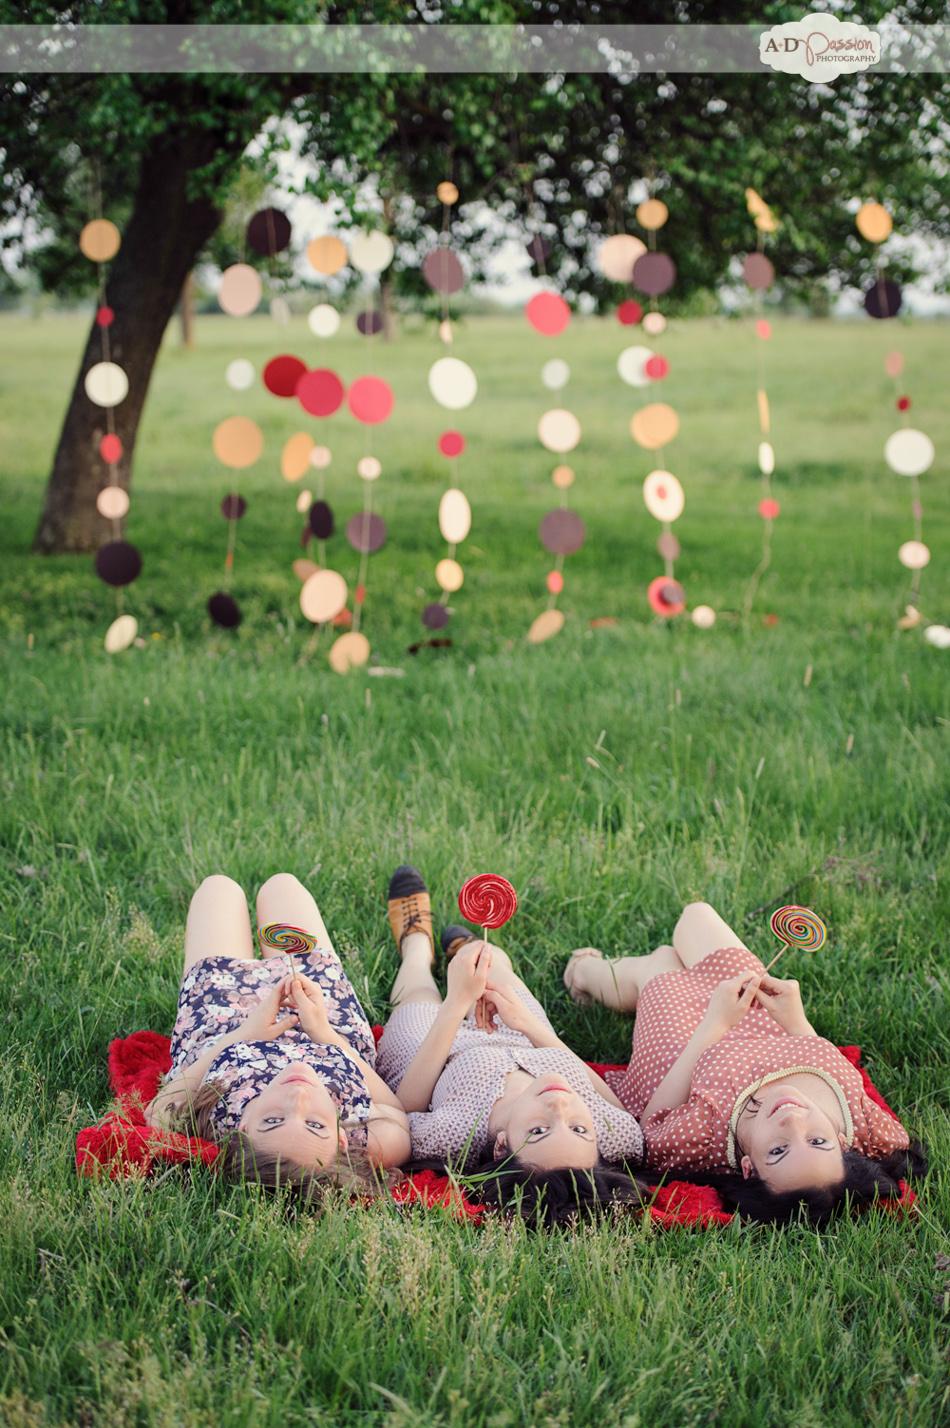 AD Passion Photography | 20130514fotograf-de-nunta_fotografie-de-familie_fotograf-personal_sedinte-foto_tzutzu-kika-bia_0007 | Adelin, Dida, fotograf profesionist, fotograf de nunta, fotografie de nunta, fotograf Timisoara, fotograf Craiova, fotograf Bucuresti, fotograf Arad, nunta Timisoara, nunta Arad, nunta Bucuresti, nunta Craiova